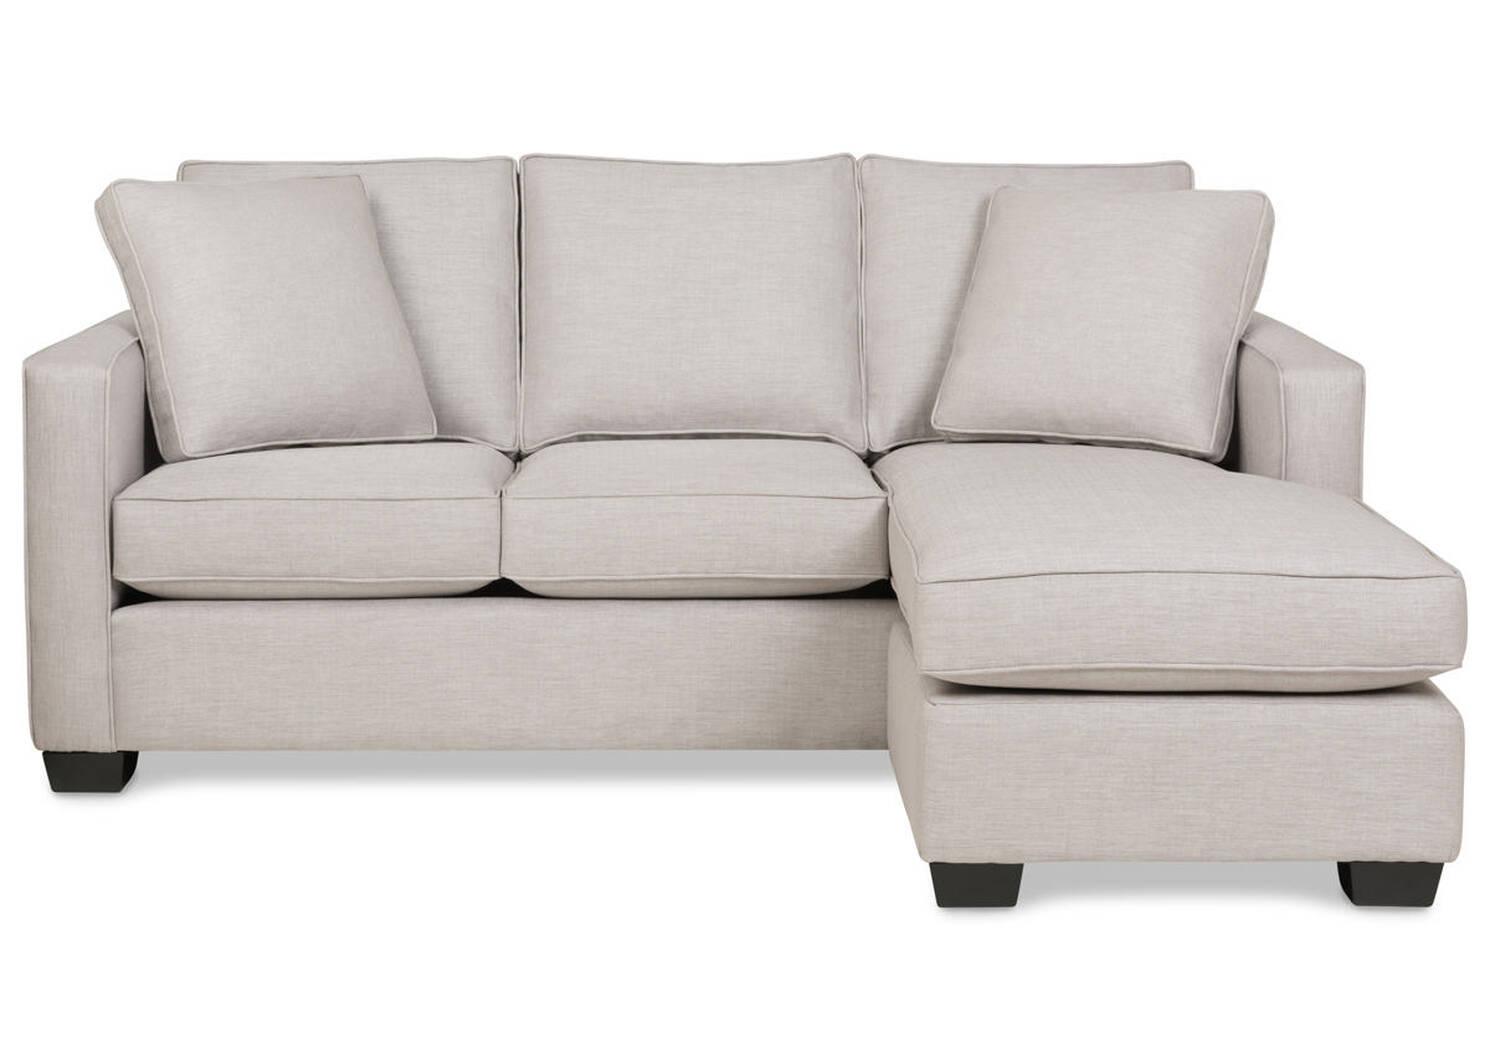 Canapé d'angle Keith personnalisé